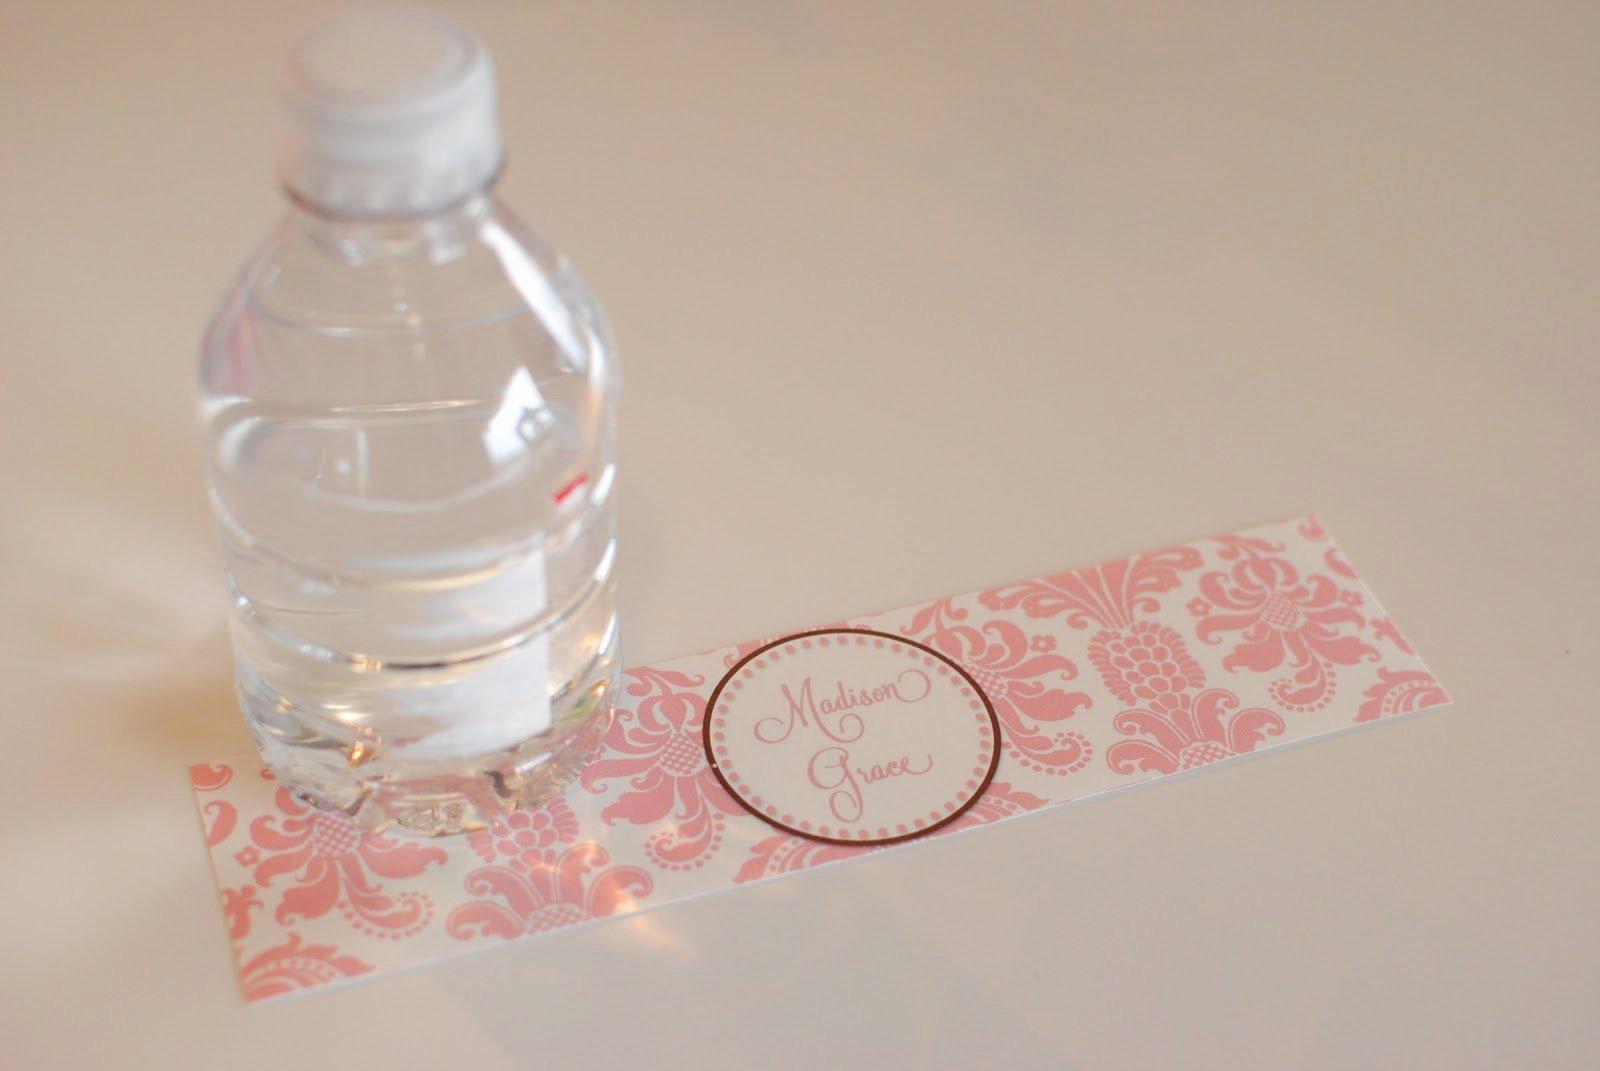 Free Water Bottle Label Template Beautiful Water Bottle Labels Template